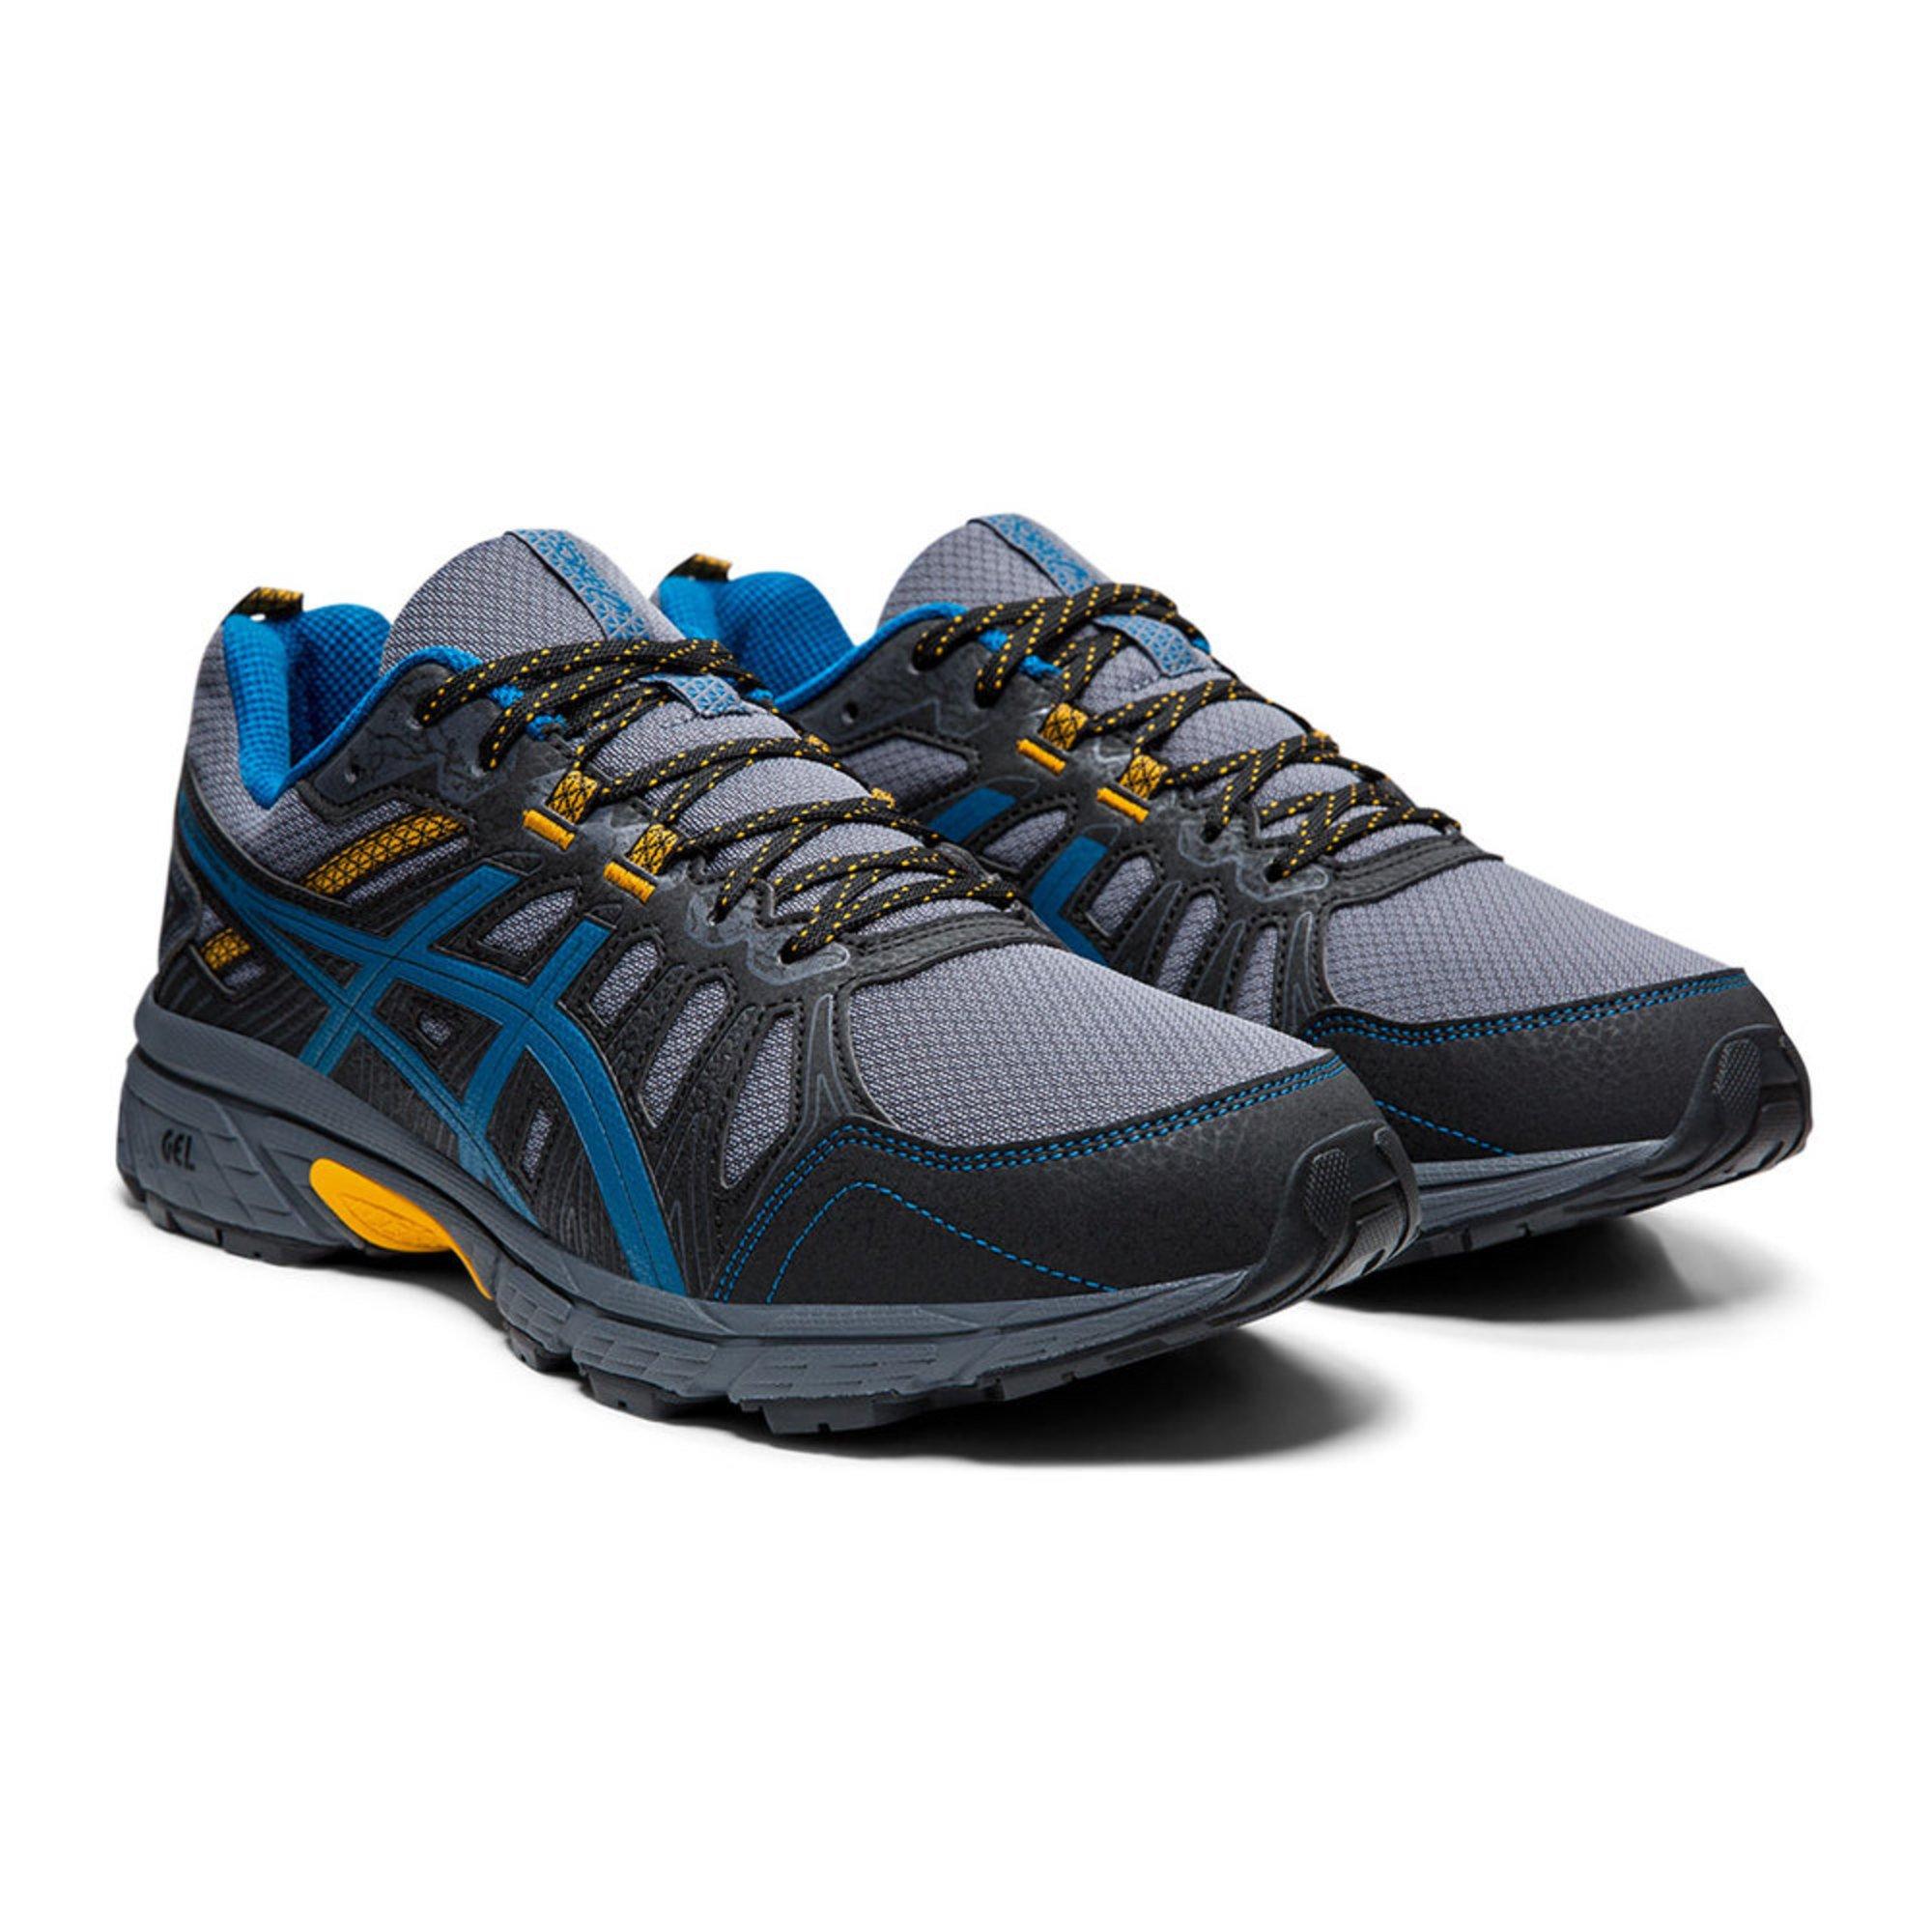 Asics Men's Gel Venture 7 Trail Running Shoe